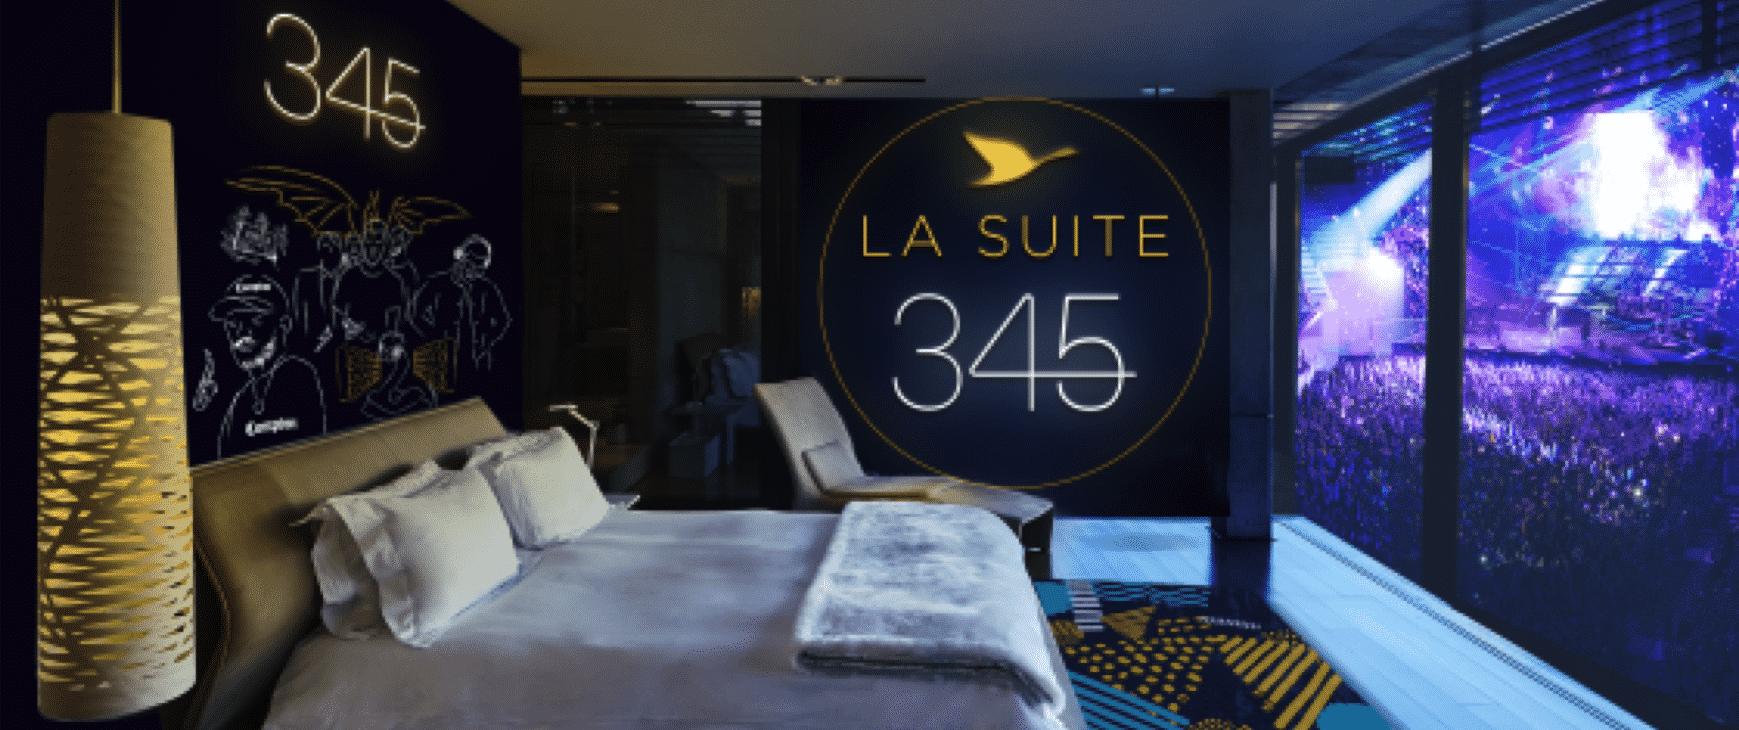 Une suite ph m re install e au coeur de l accorhotels arena for Hotels 02 arena